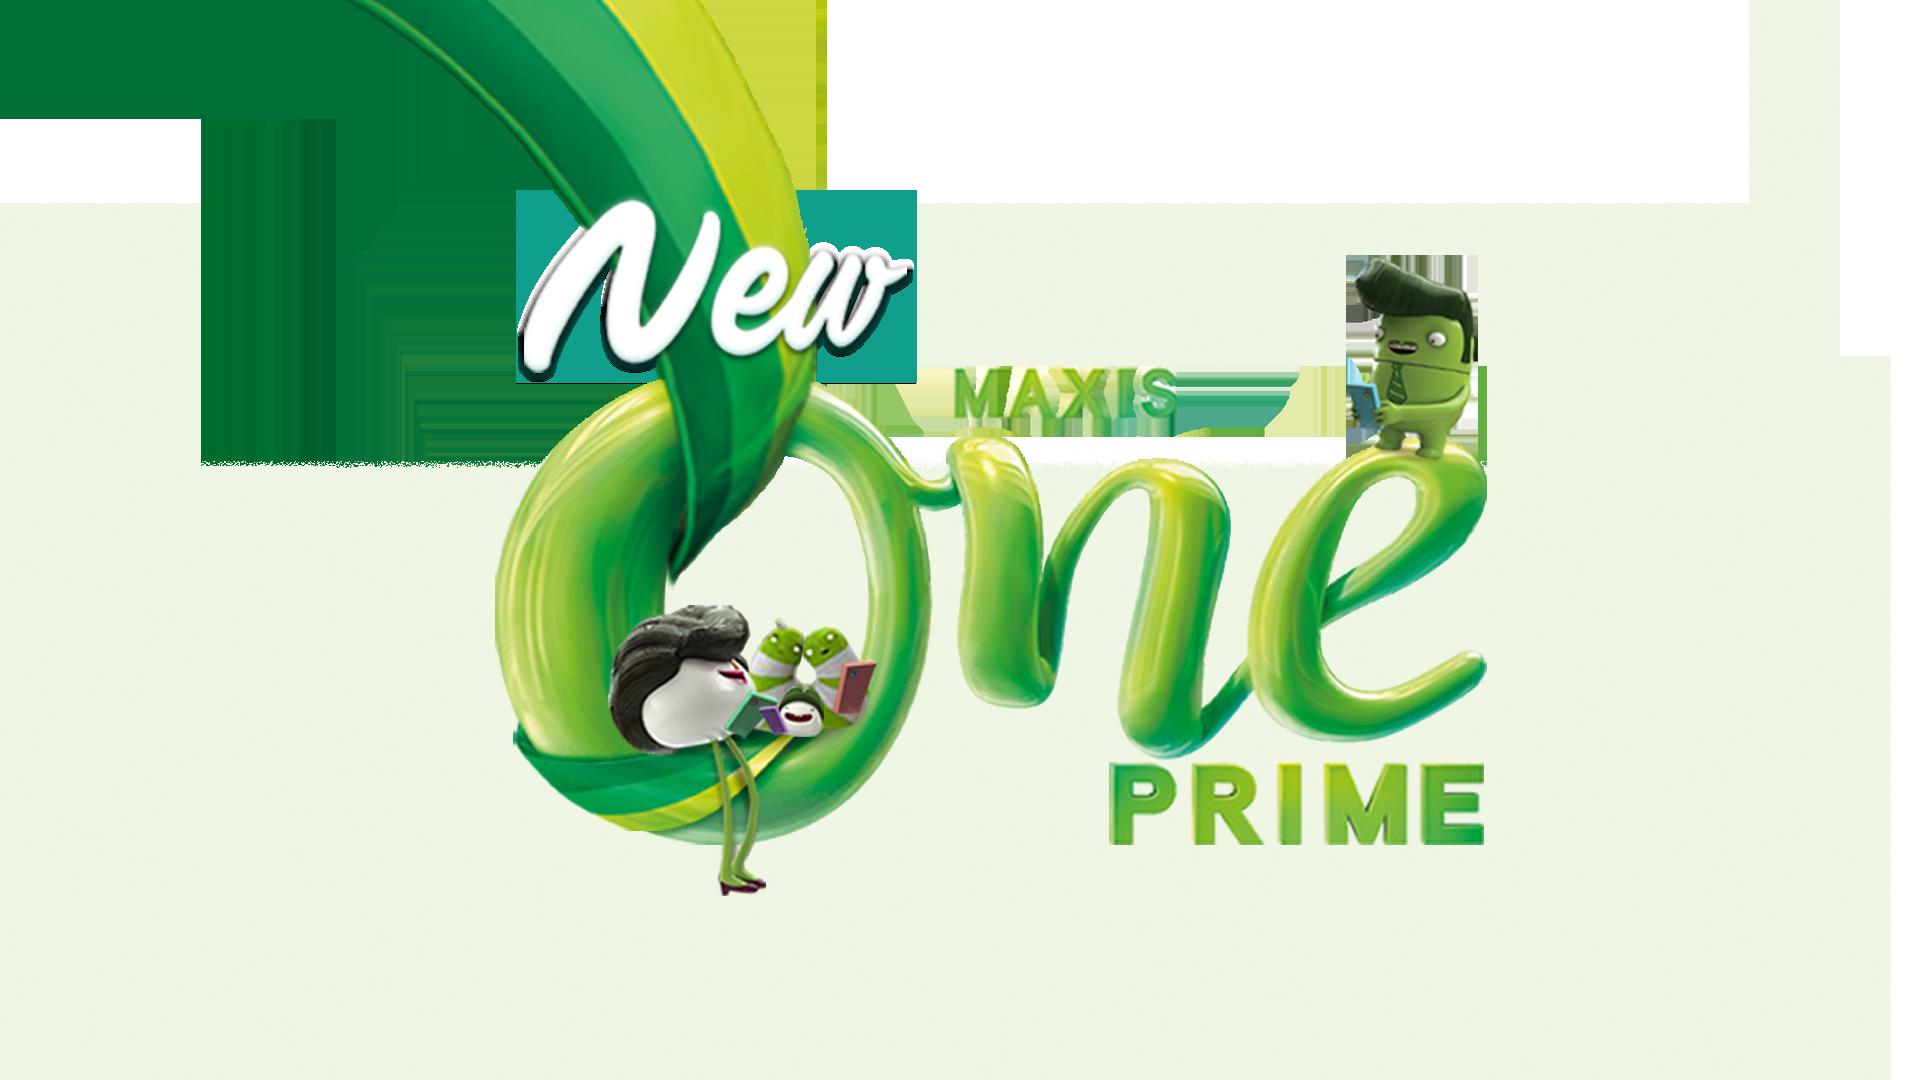 MaxisONE Prime现在为Mobile和Home Fibre Broadband配套提供无限网络数据!